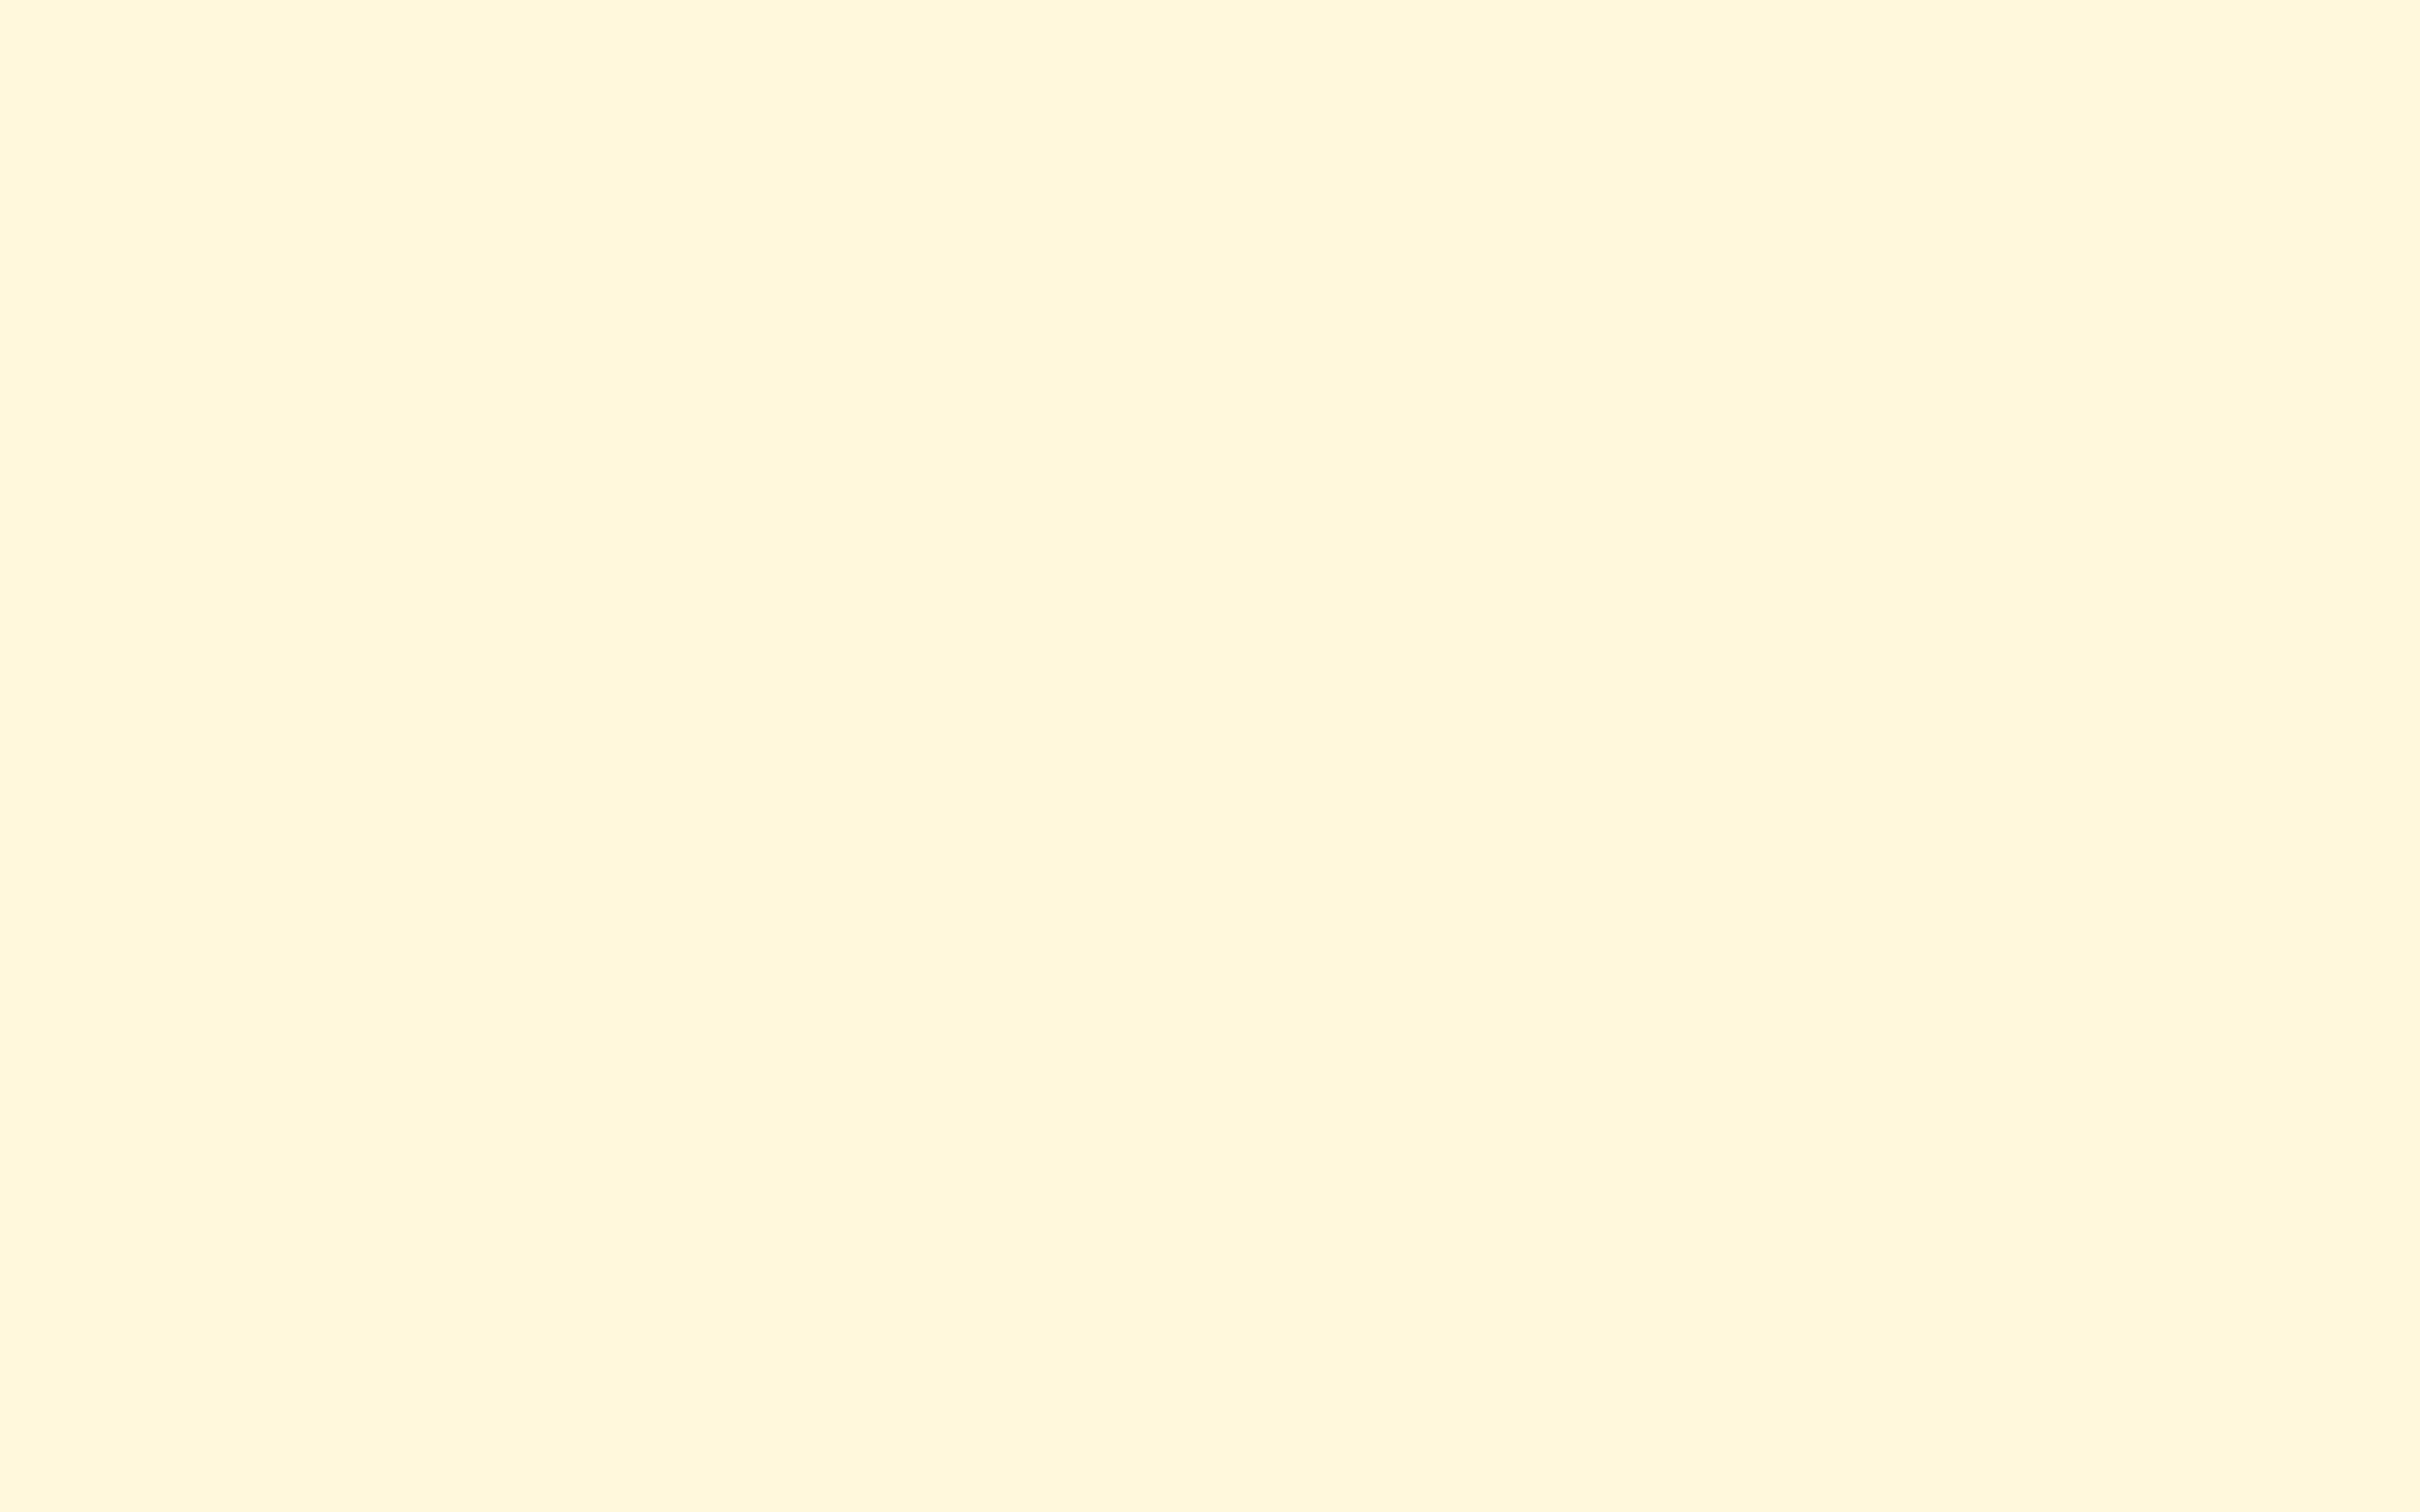 2560x1600 Cornsilk Solid Color Background